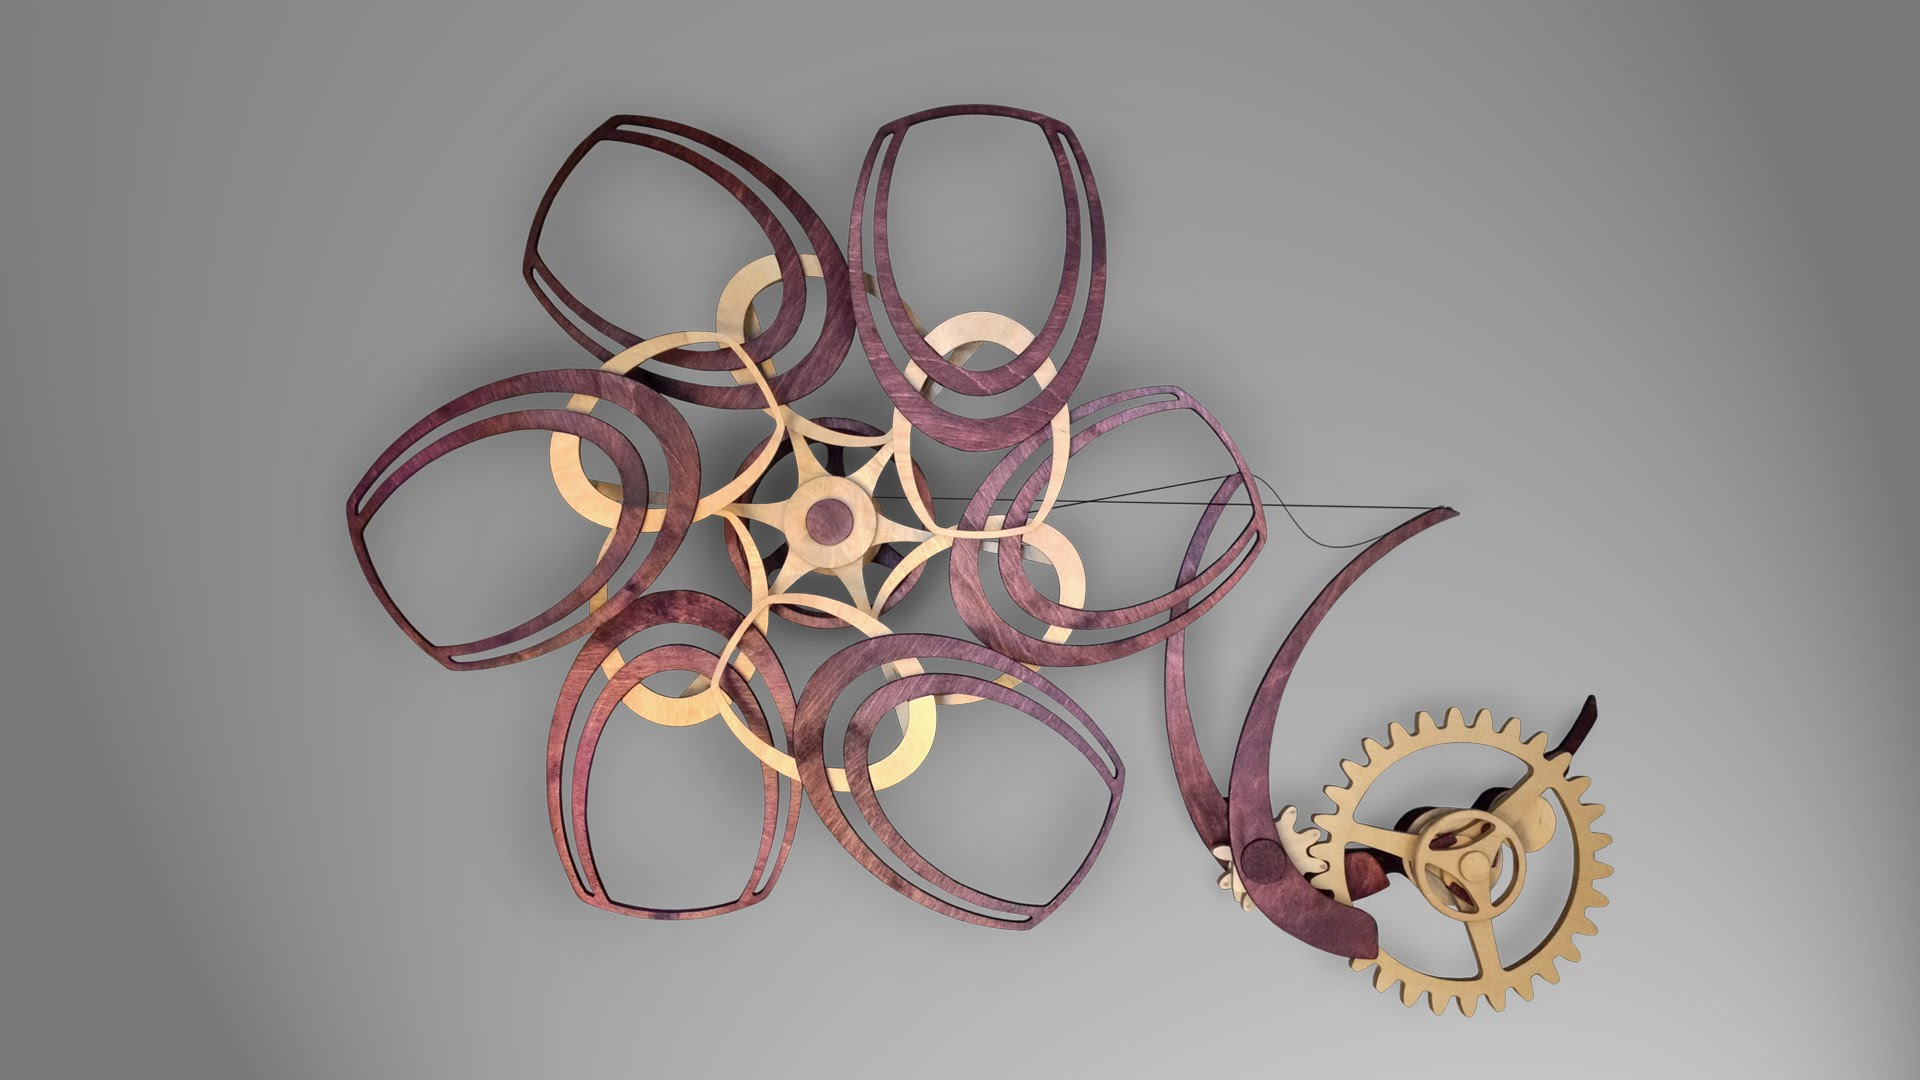 kinetic-wall-sculpture_geek-gadgets